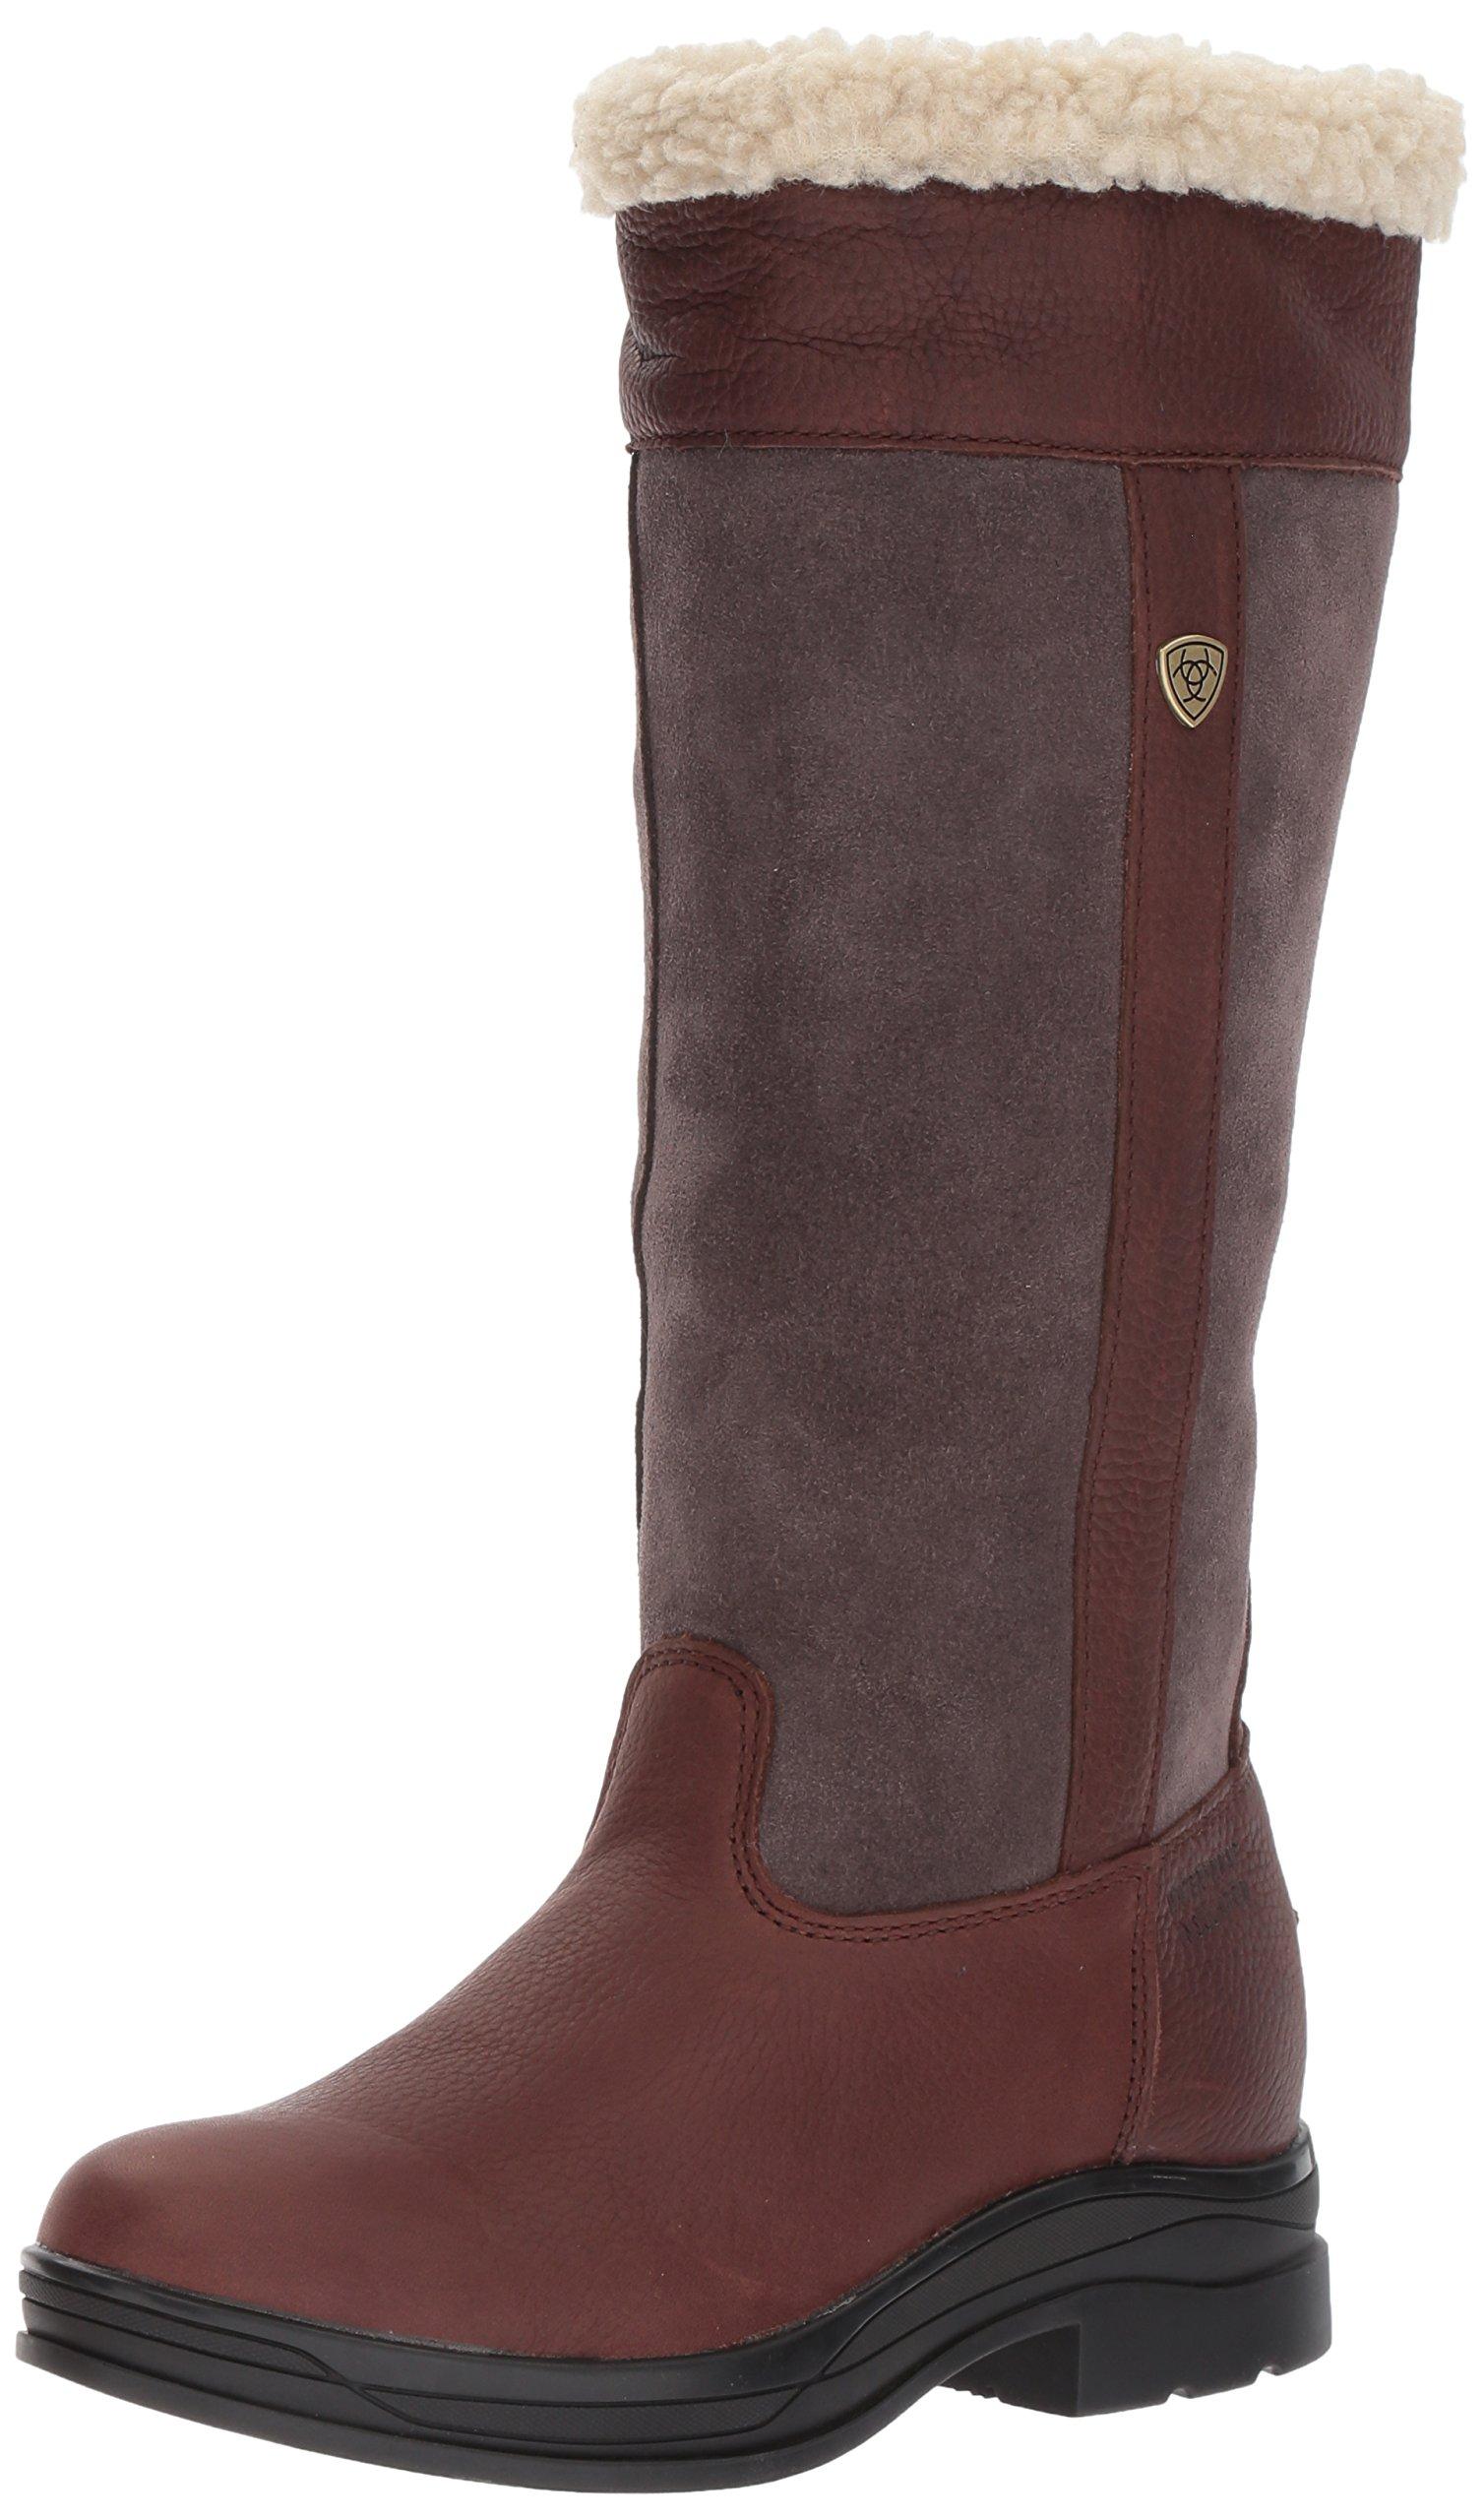 Ariat Women's Windermere H2O Work Boot, Dark Brown, 8.5 B US